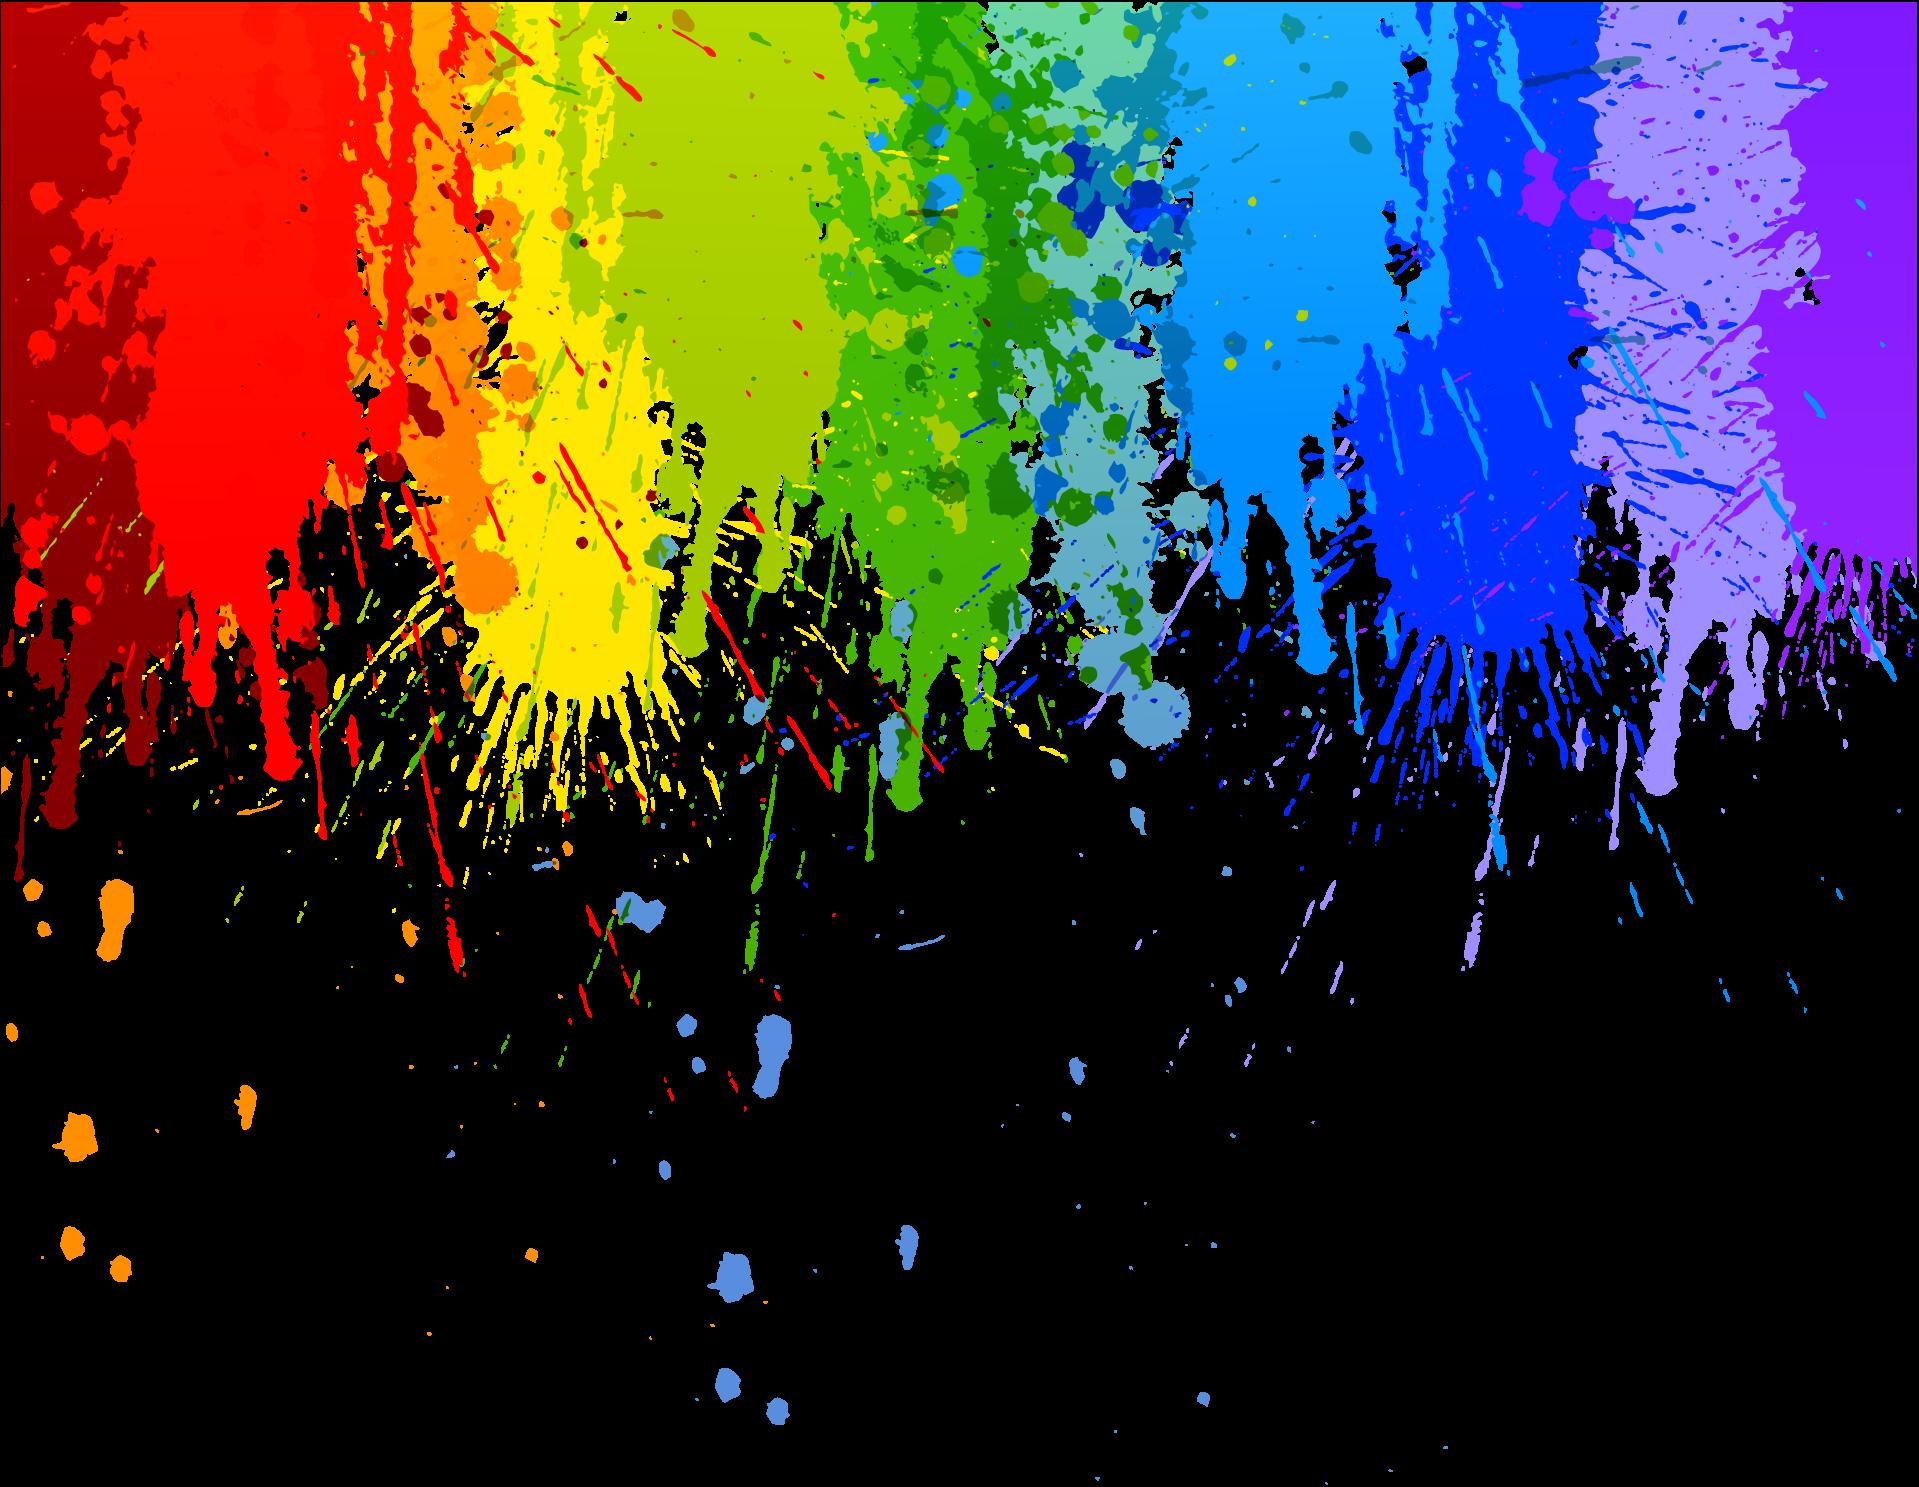 Rainbow Colour Splash Drip Transparent Background in 2019.